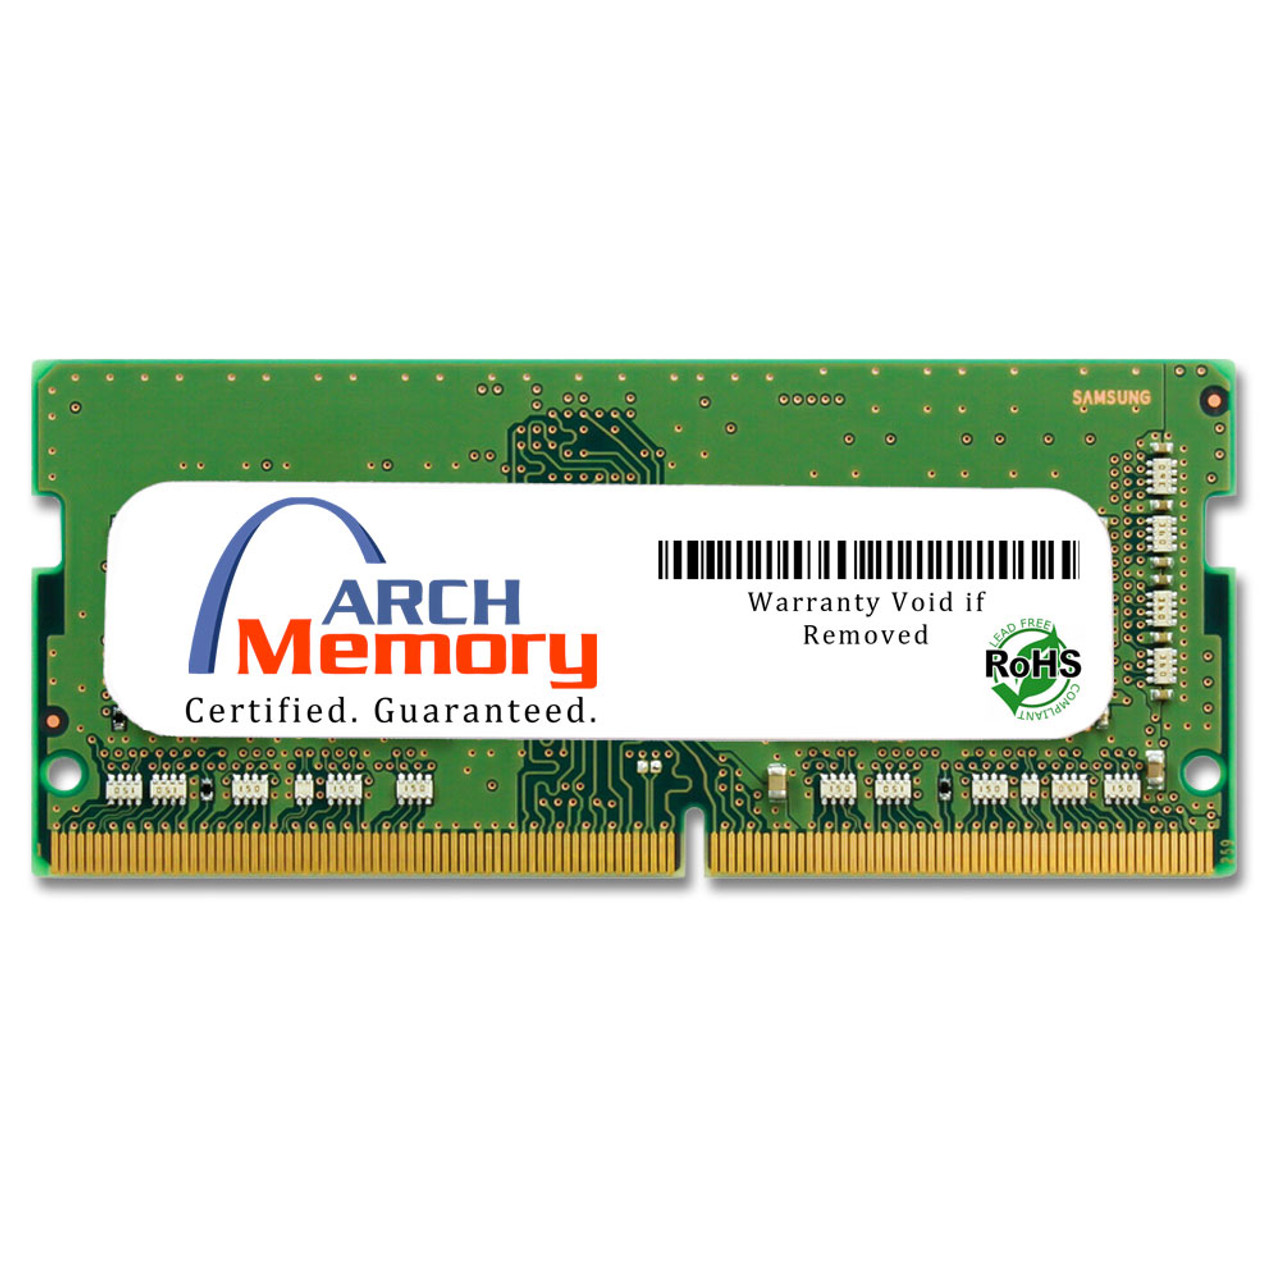 4GB 260-Pin DDR4-2666 PC4-21300 Sodimm (1Rx8) RAM